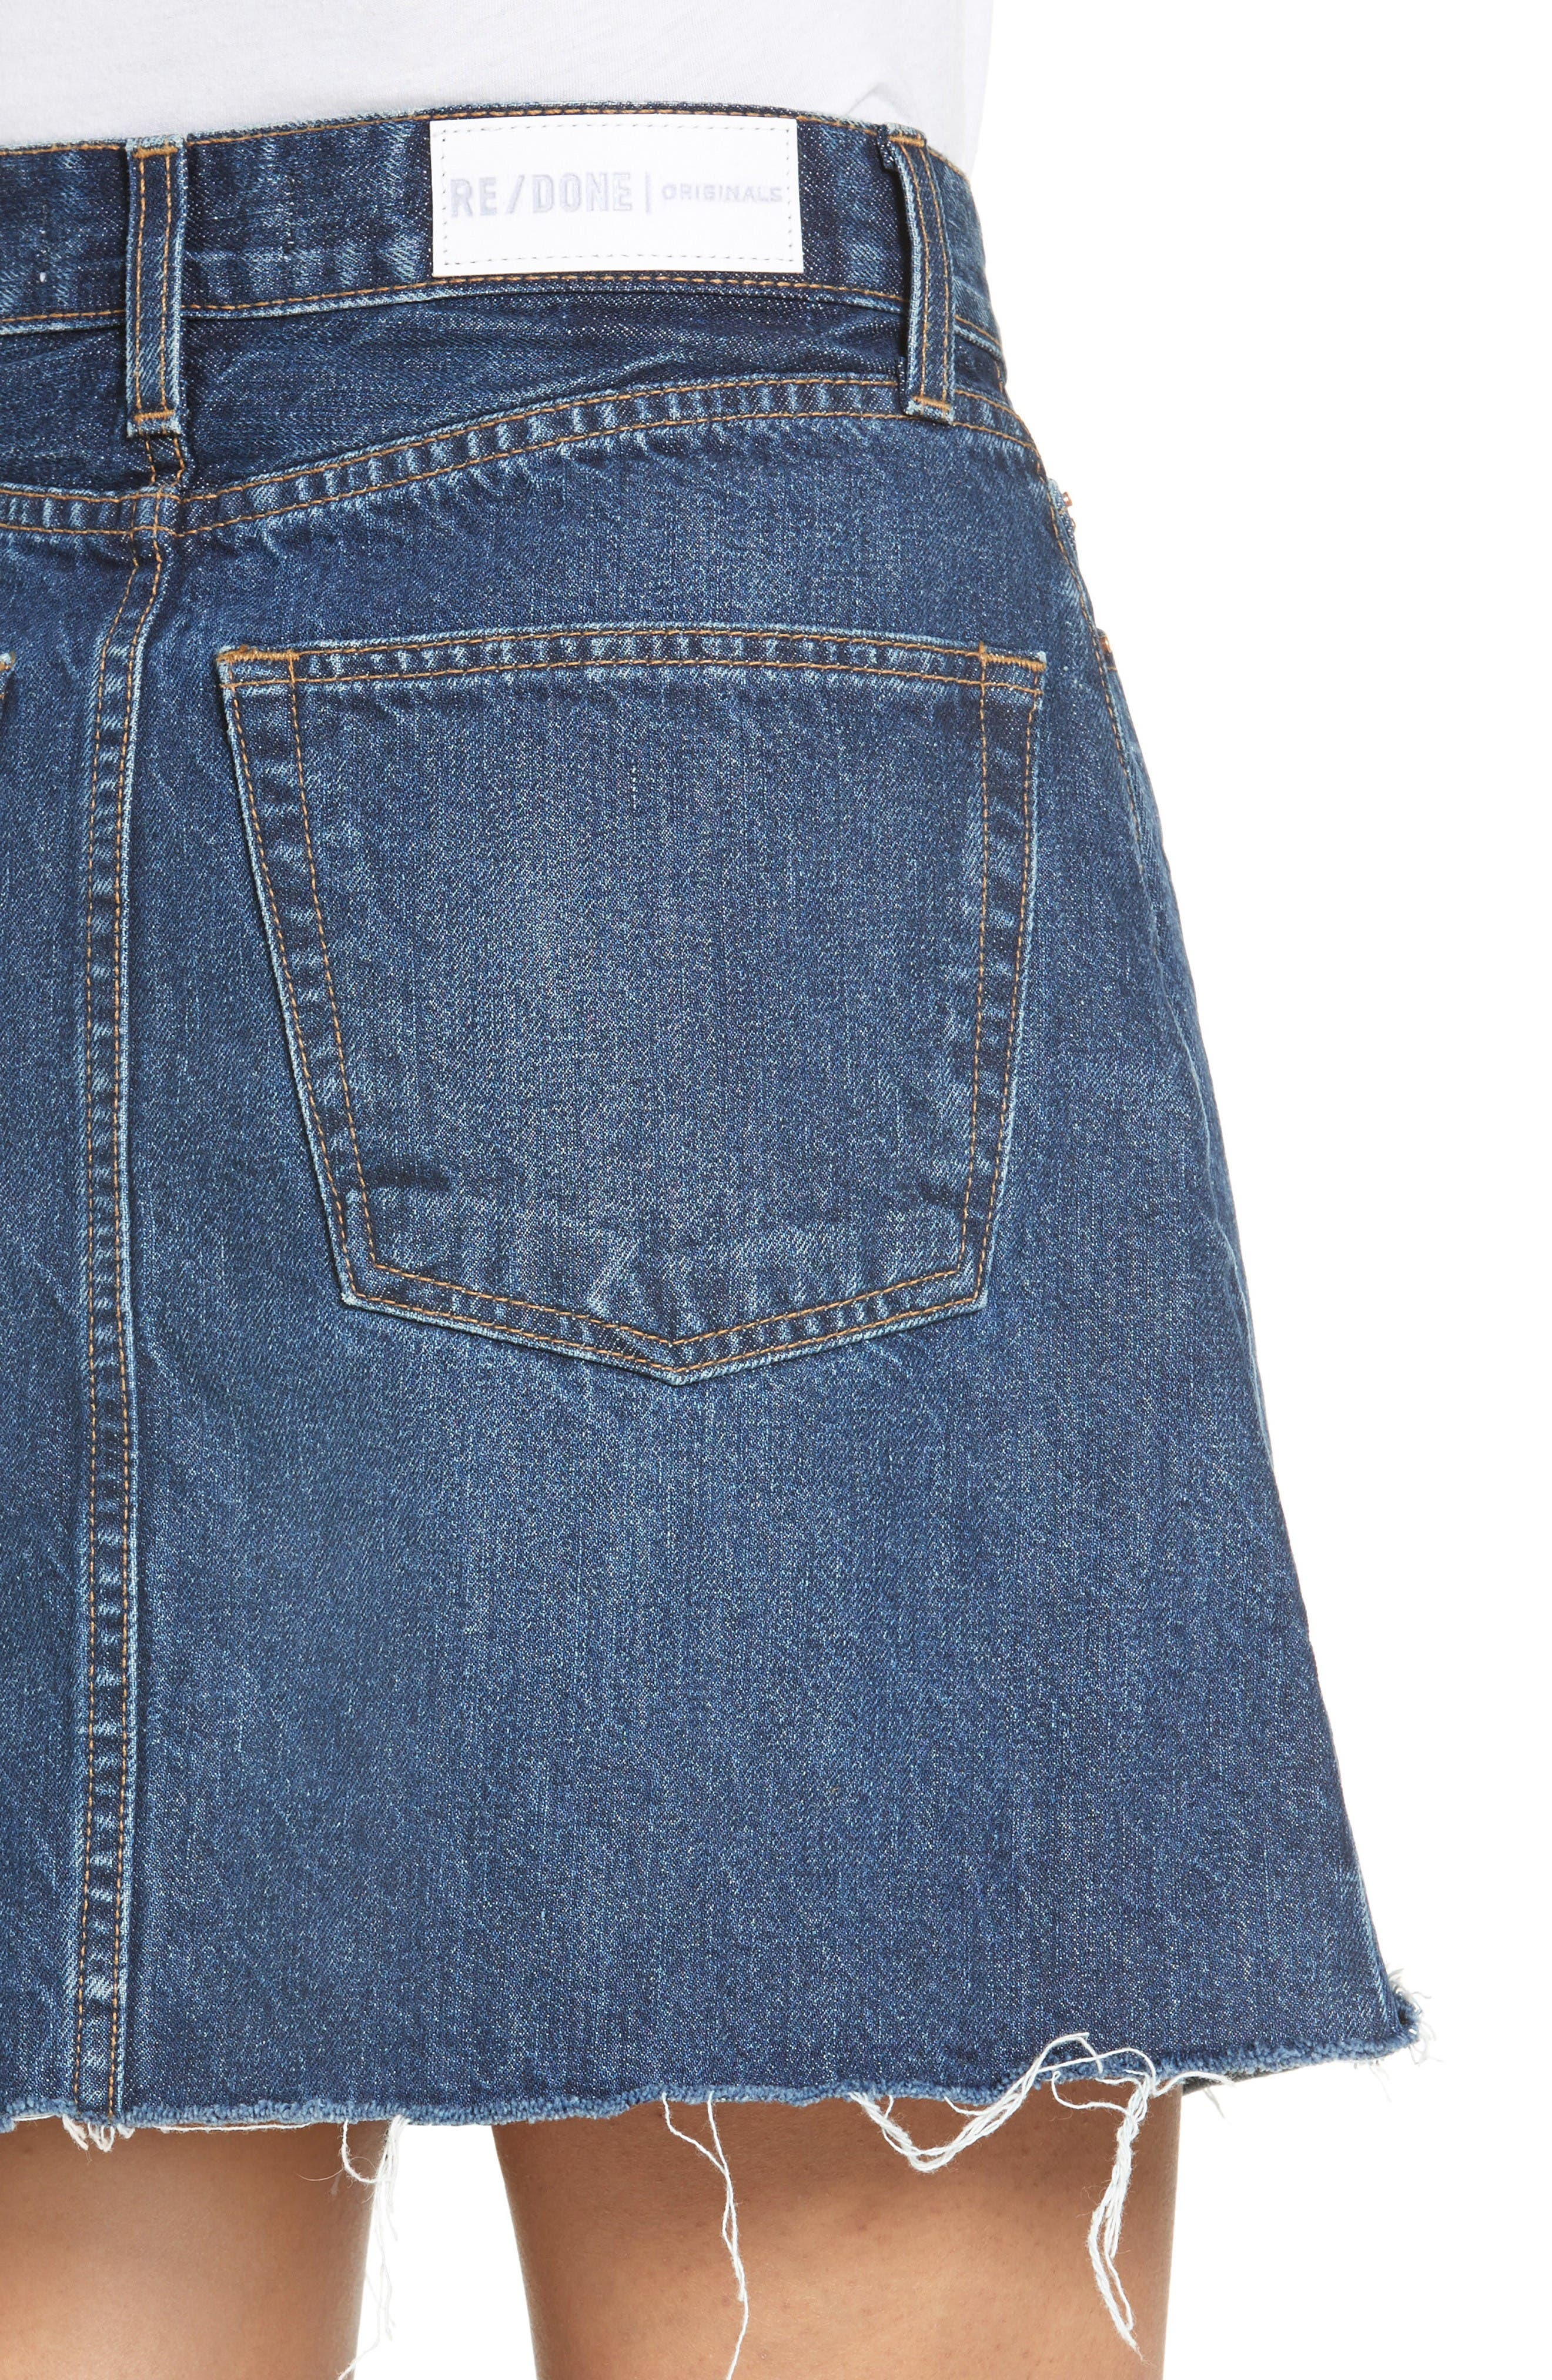 Alternate Image 4  - Re/Done Originals High Waist Denim Miniskirt